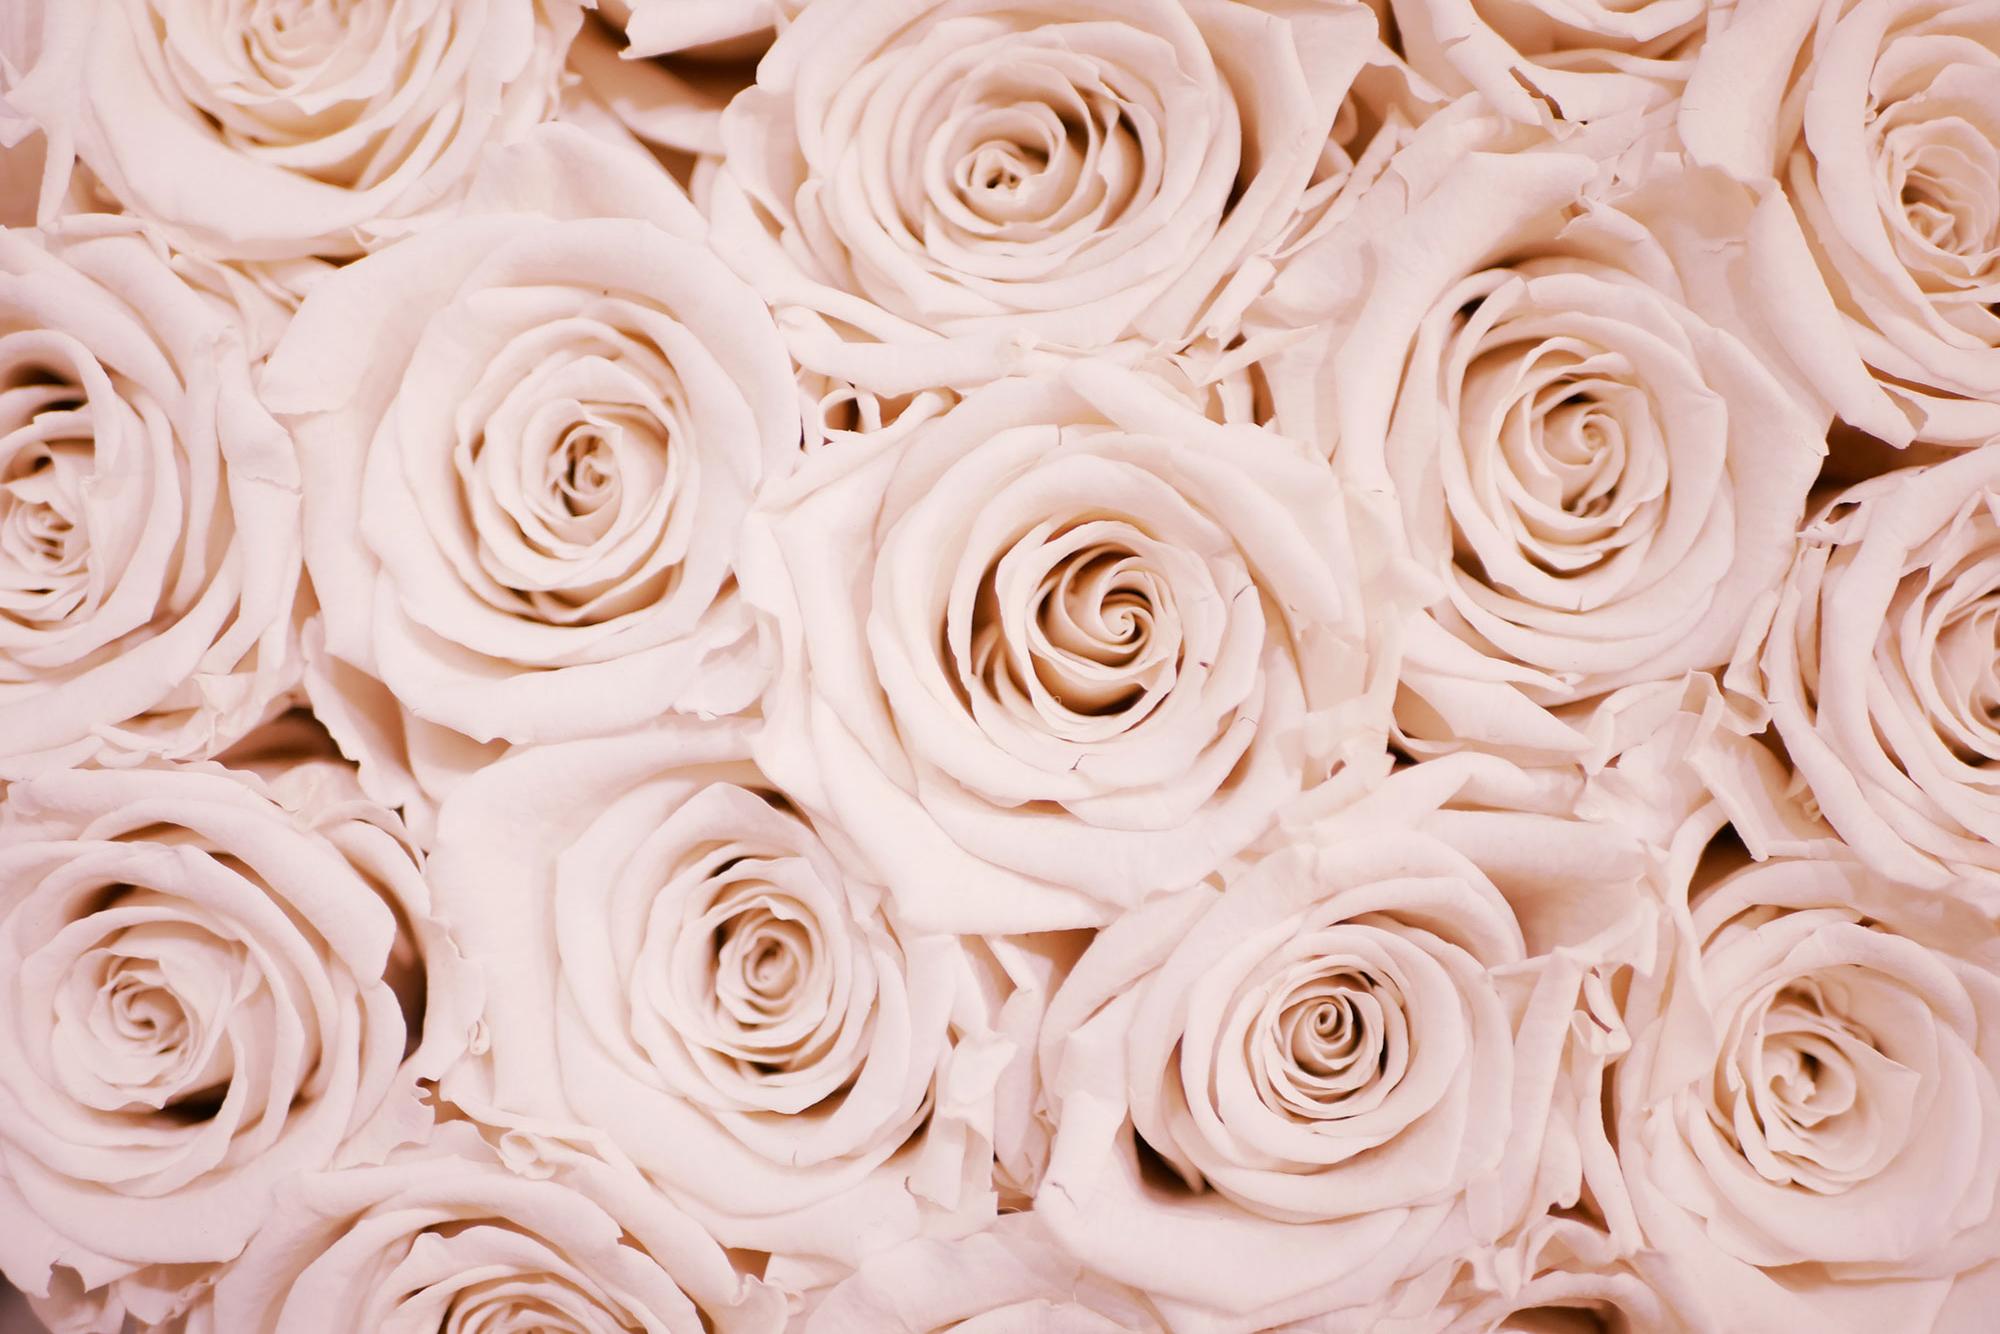 Pink Rose Flower Blooms Bouquet Art Print Wall Decor Image